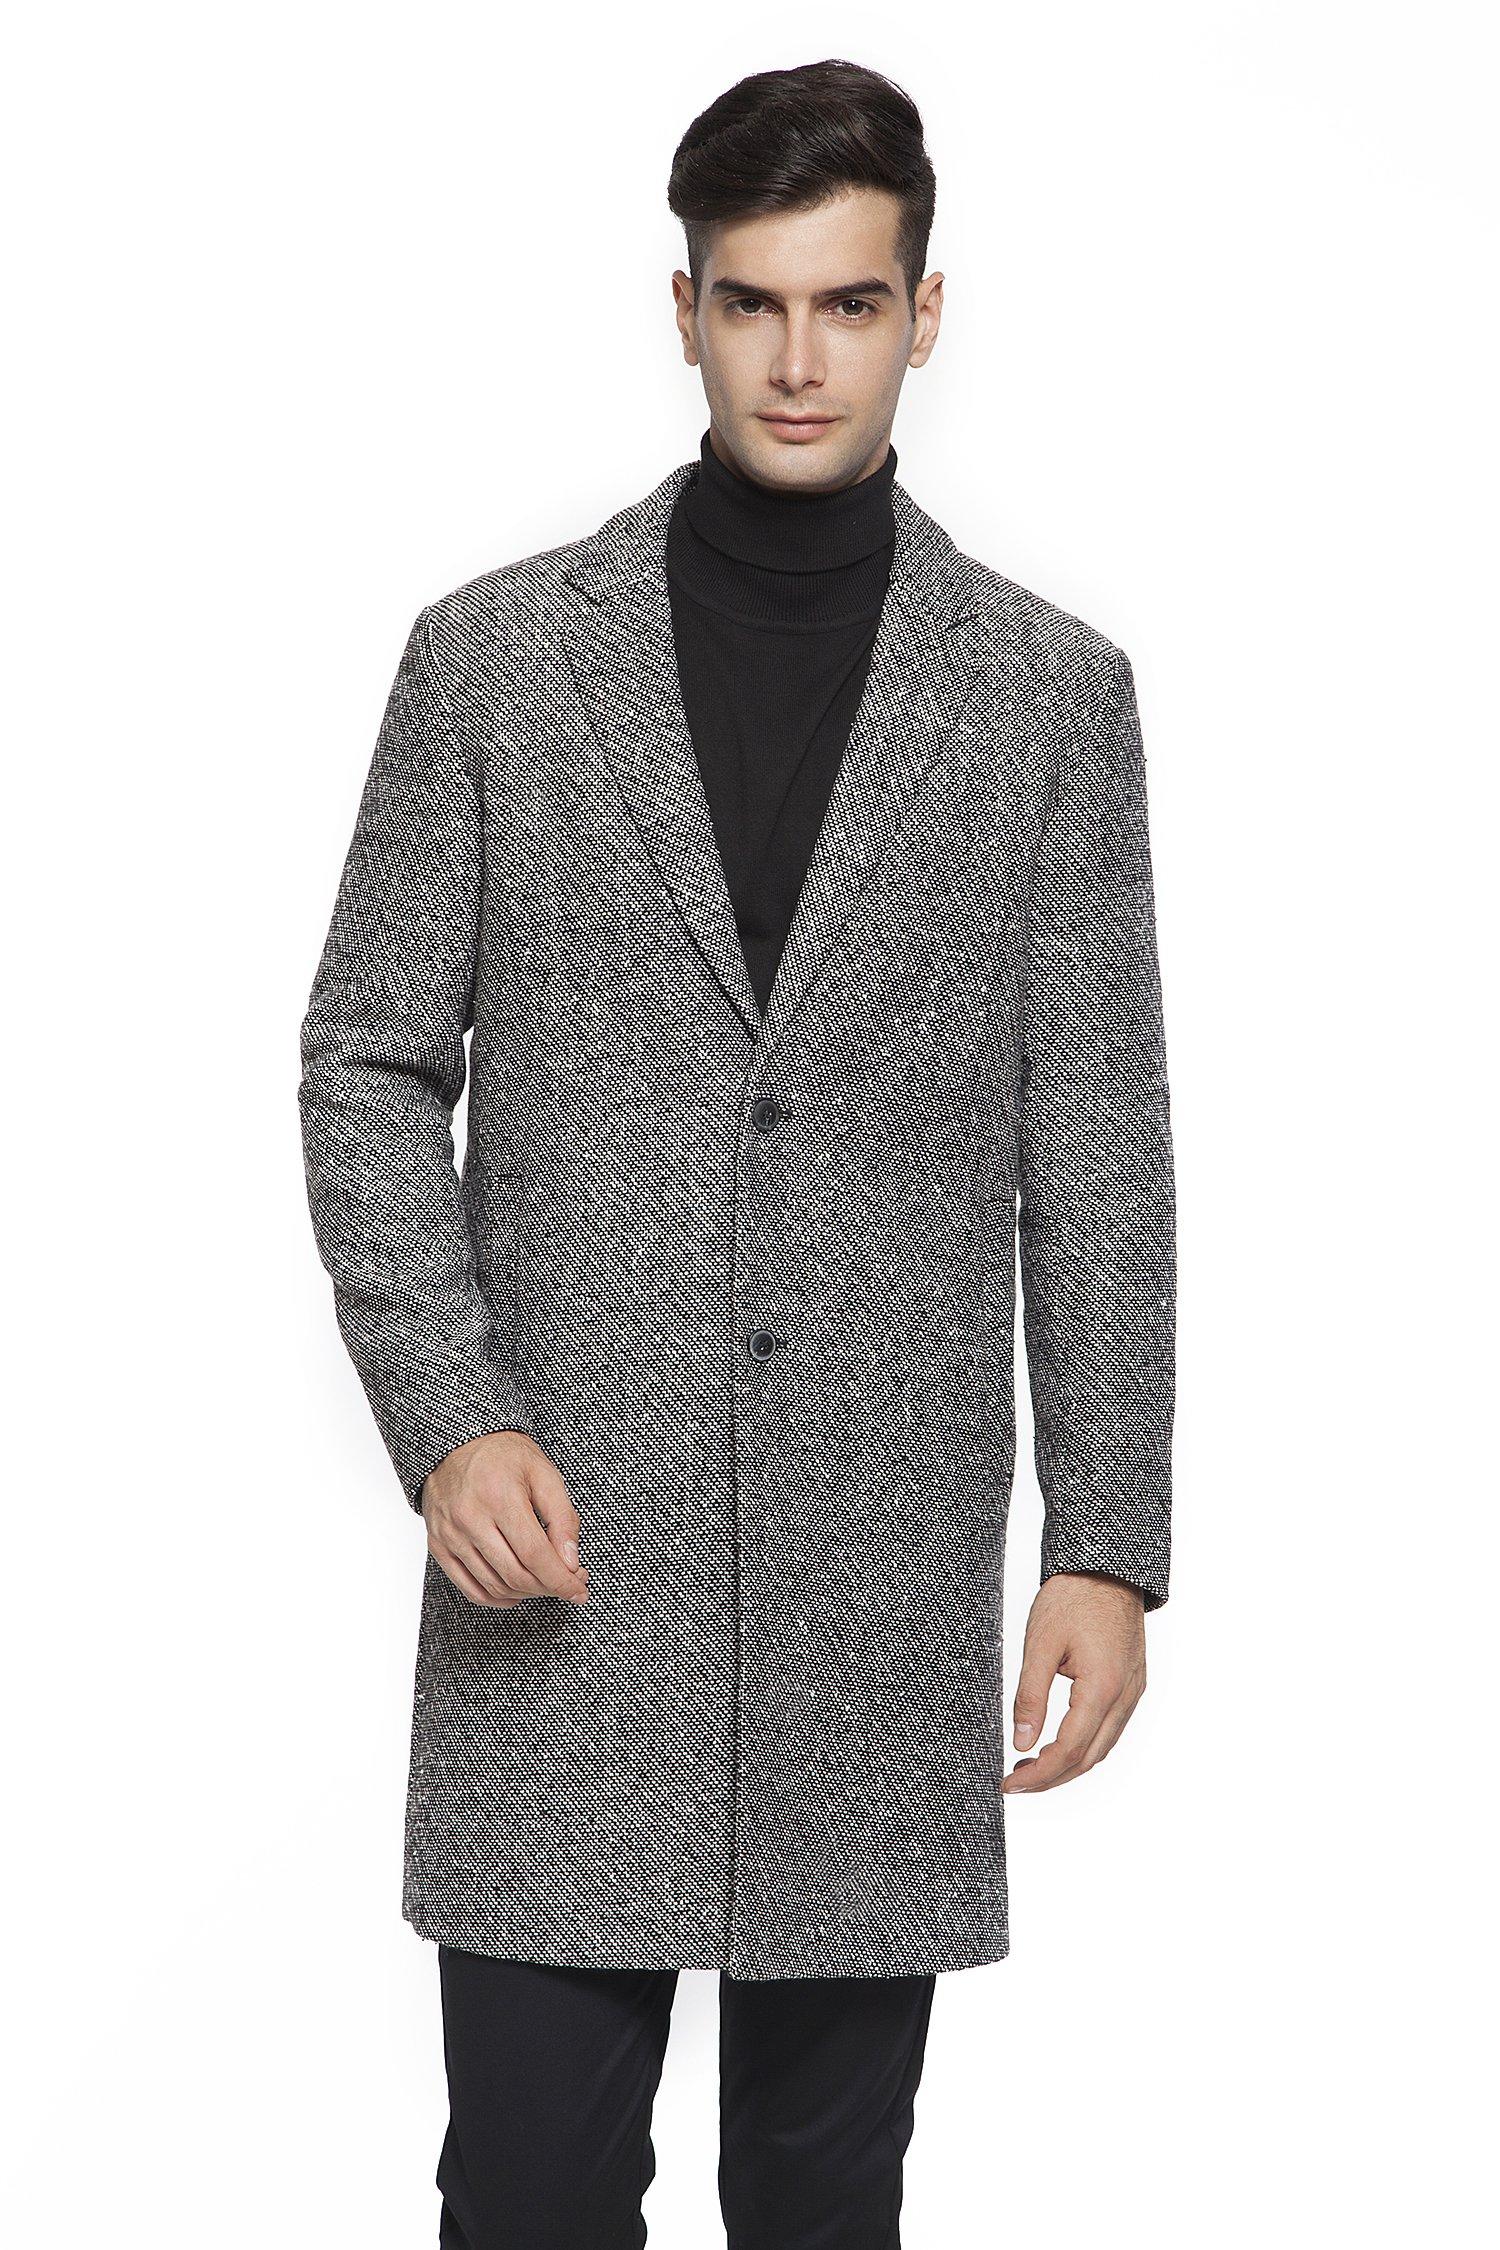 RLM Men's Single Breasted Woolen Trench Coat Overcoat Long Jacket (40, Black-White)